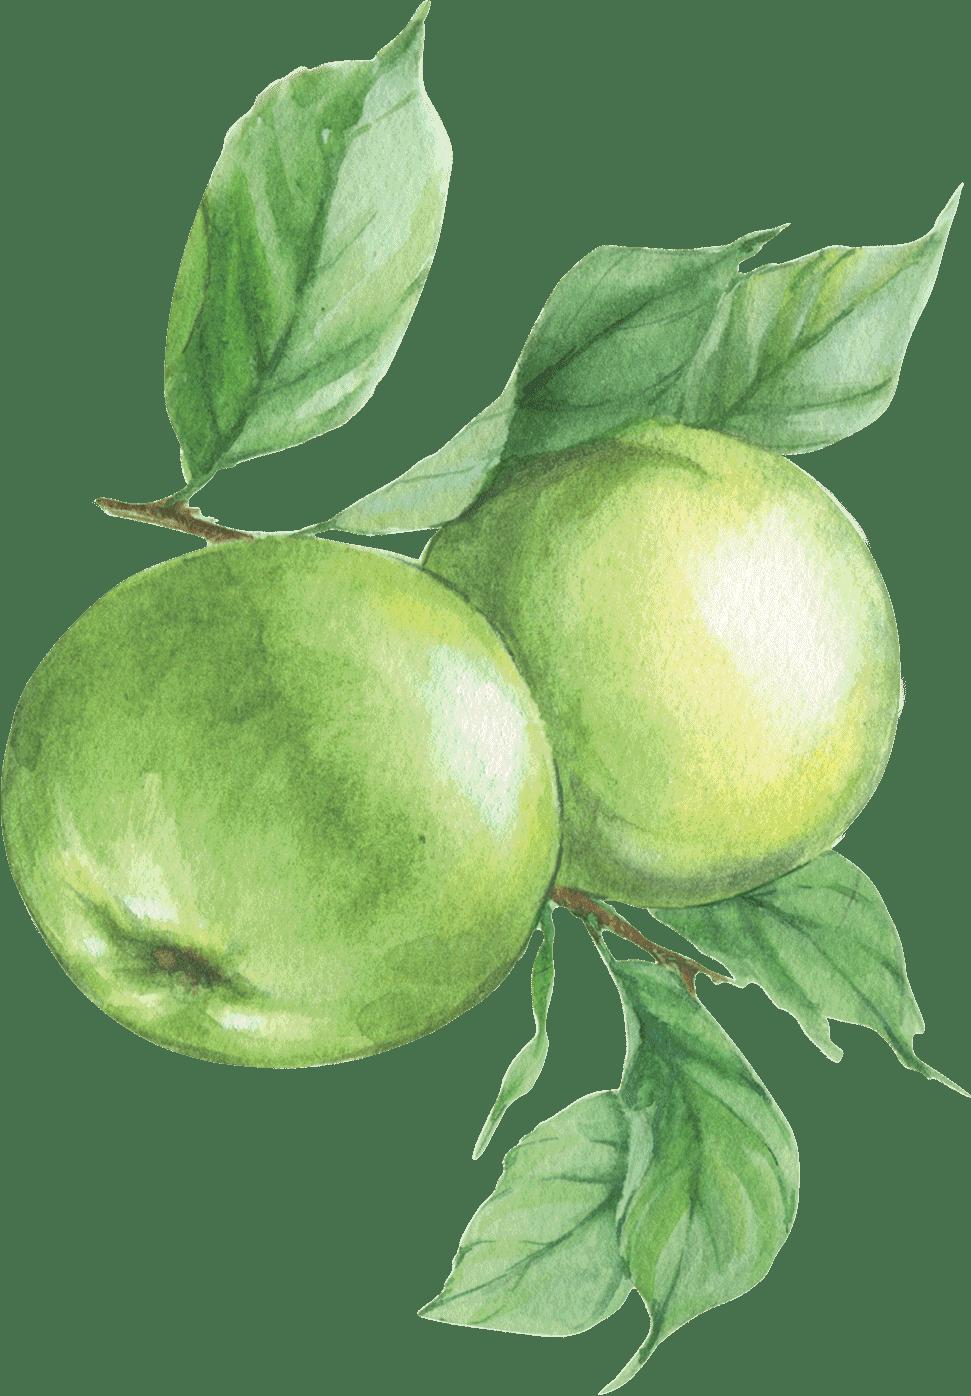 Staple food, Natural foods, Plant, Flower, Fruit, Tree